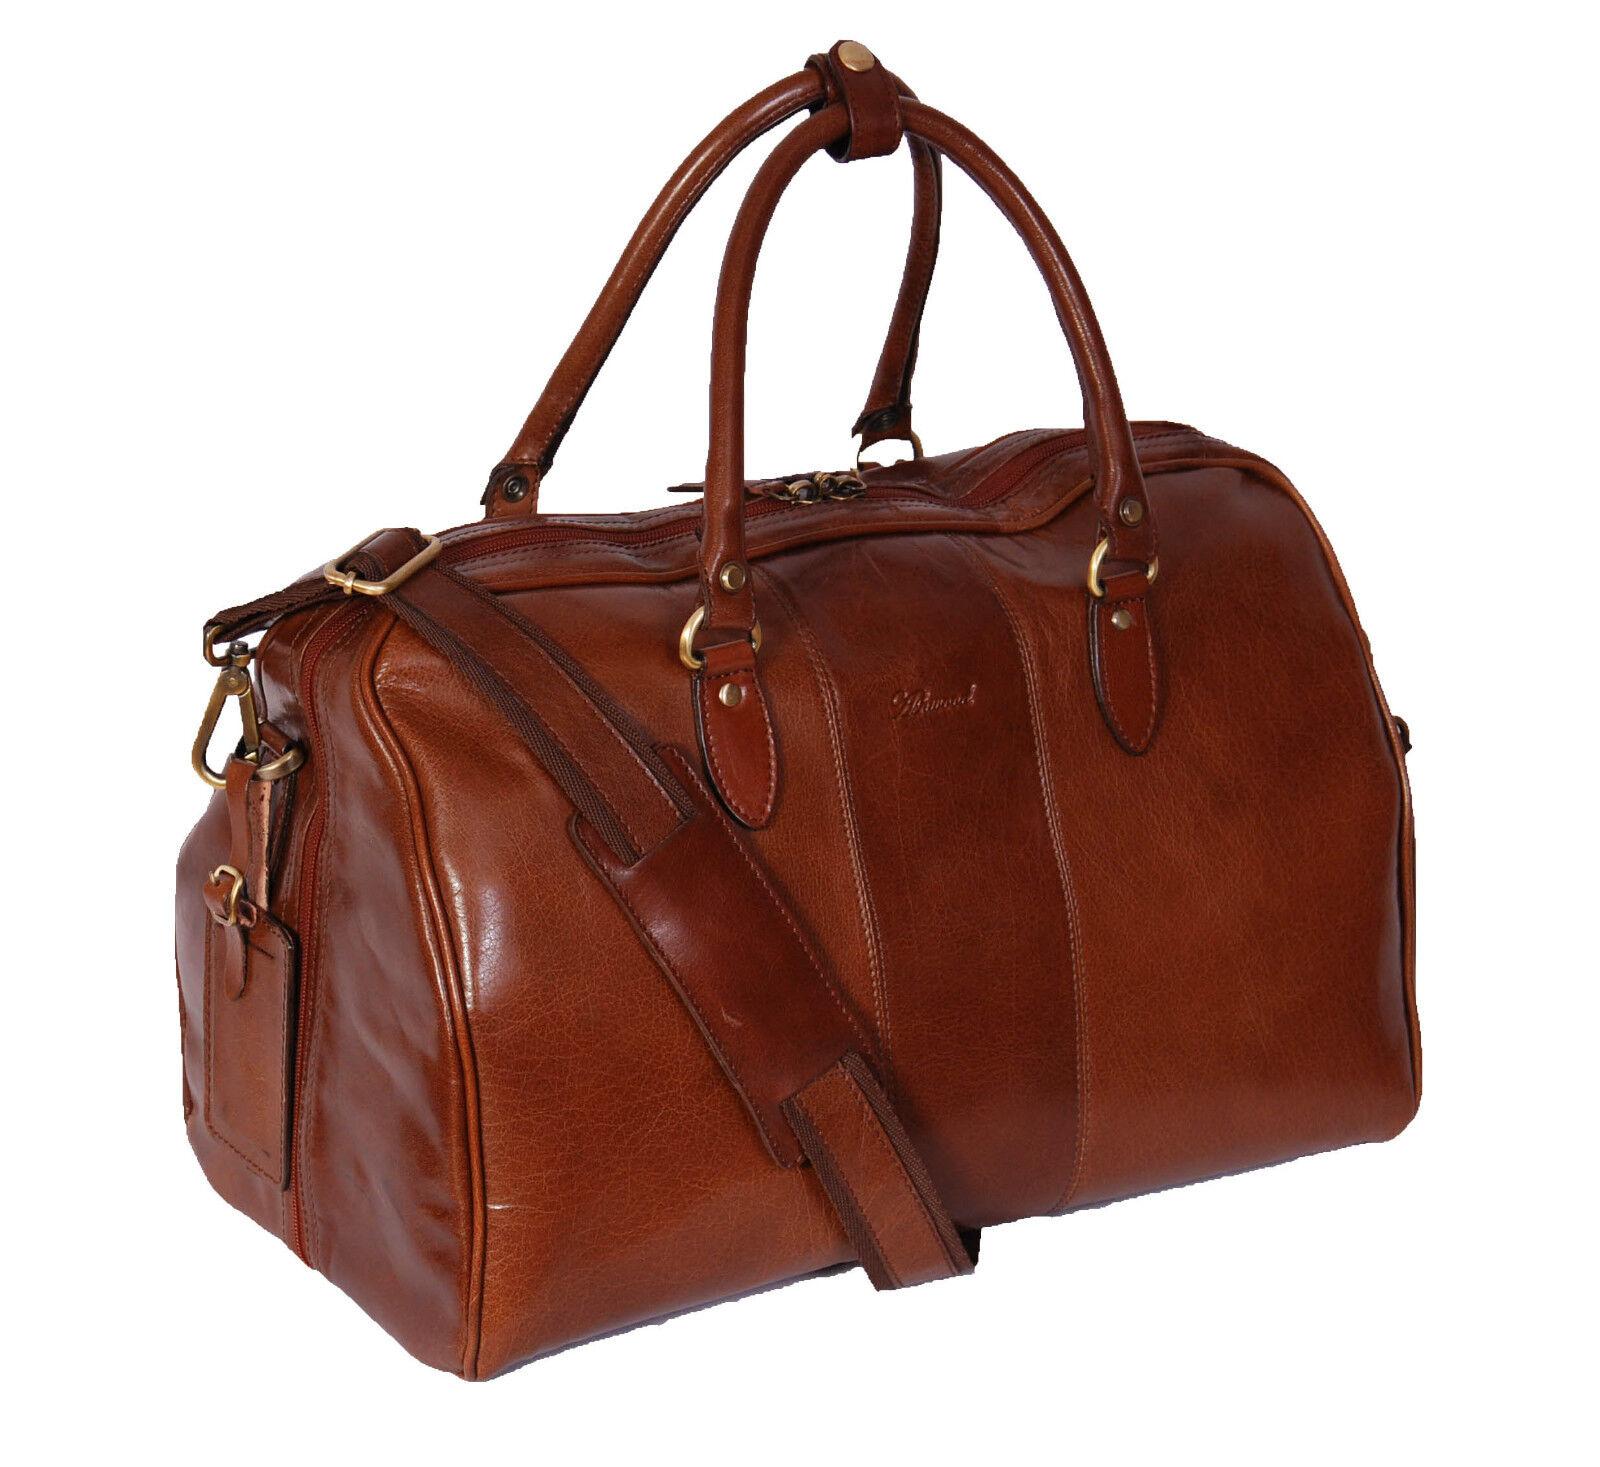 Genuine cuir Holdall Weekend Cabin voyage Gym Sports Duffle sac Chestnut nouveau